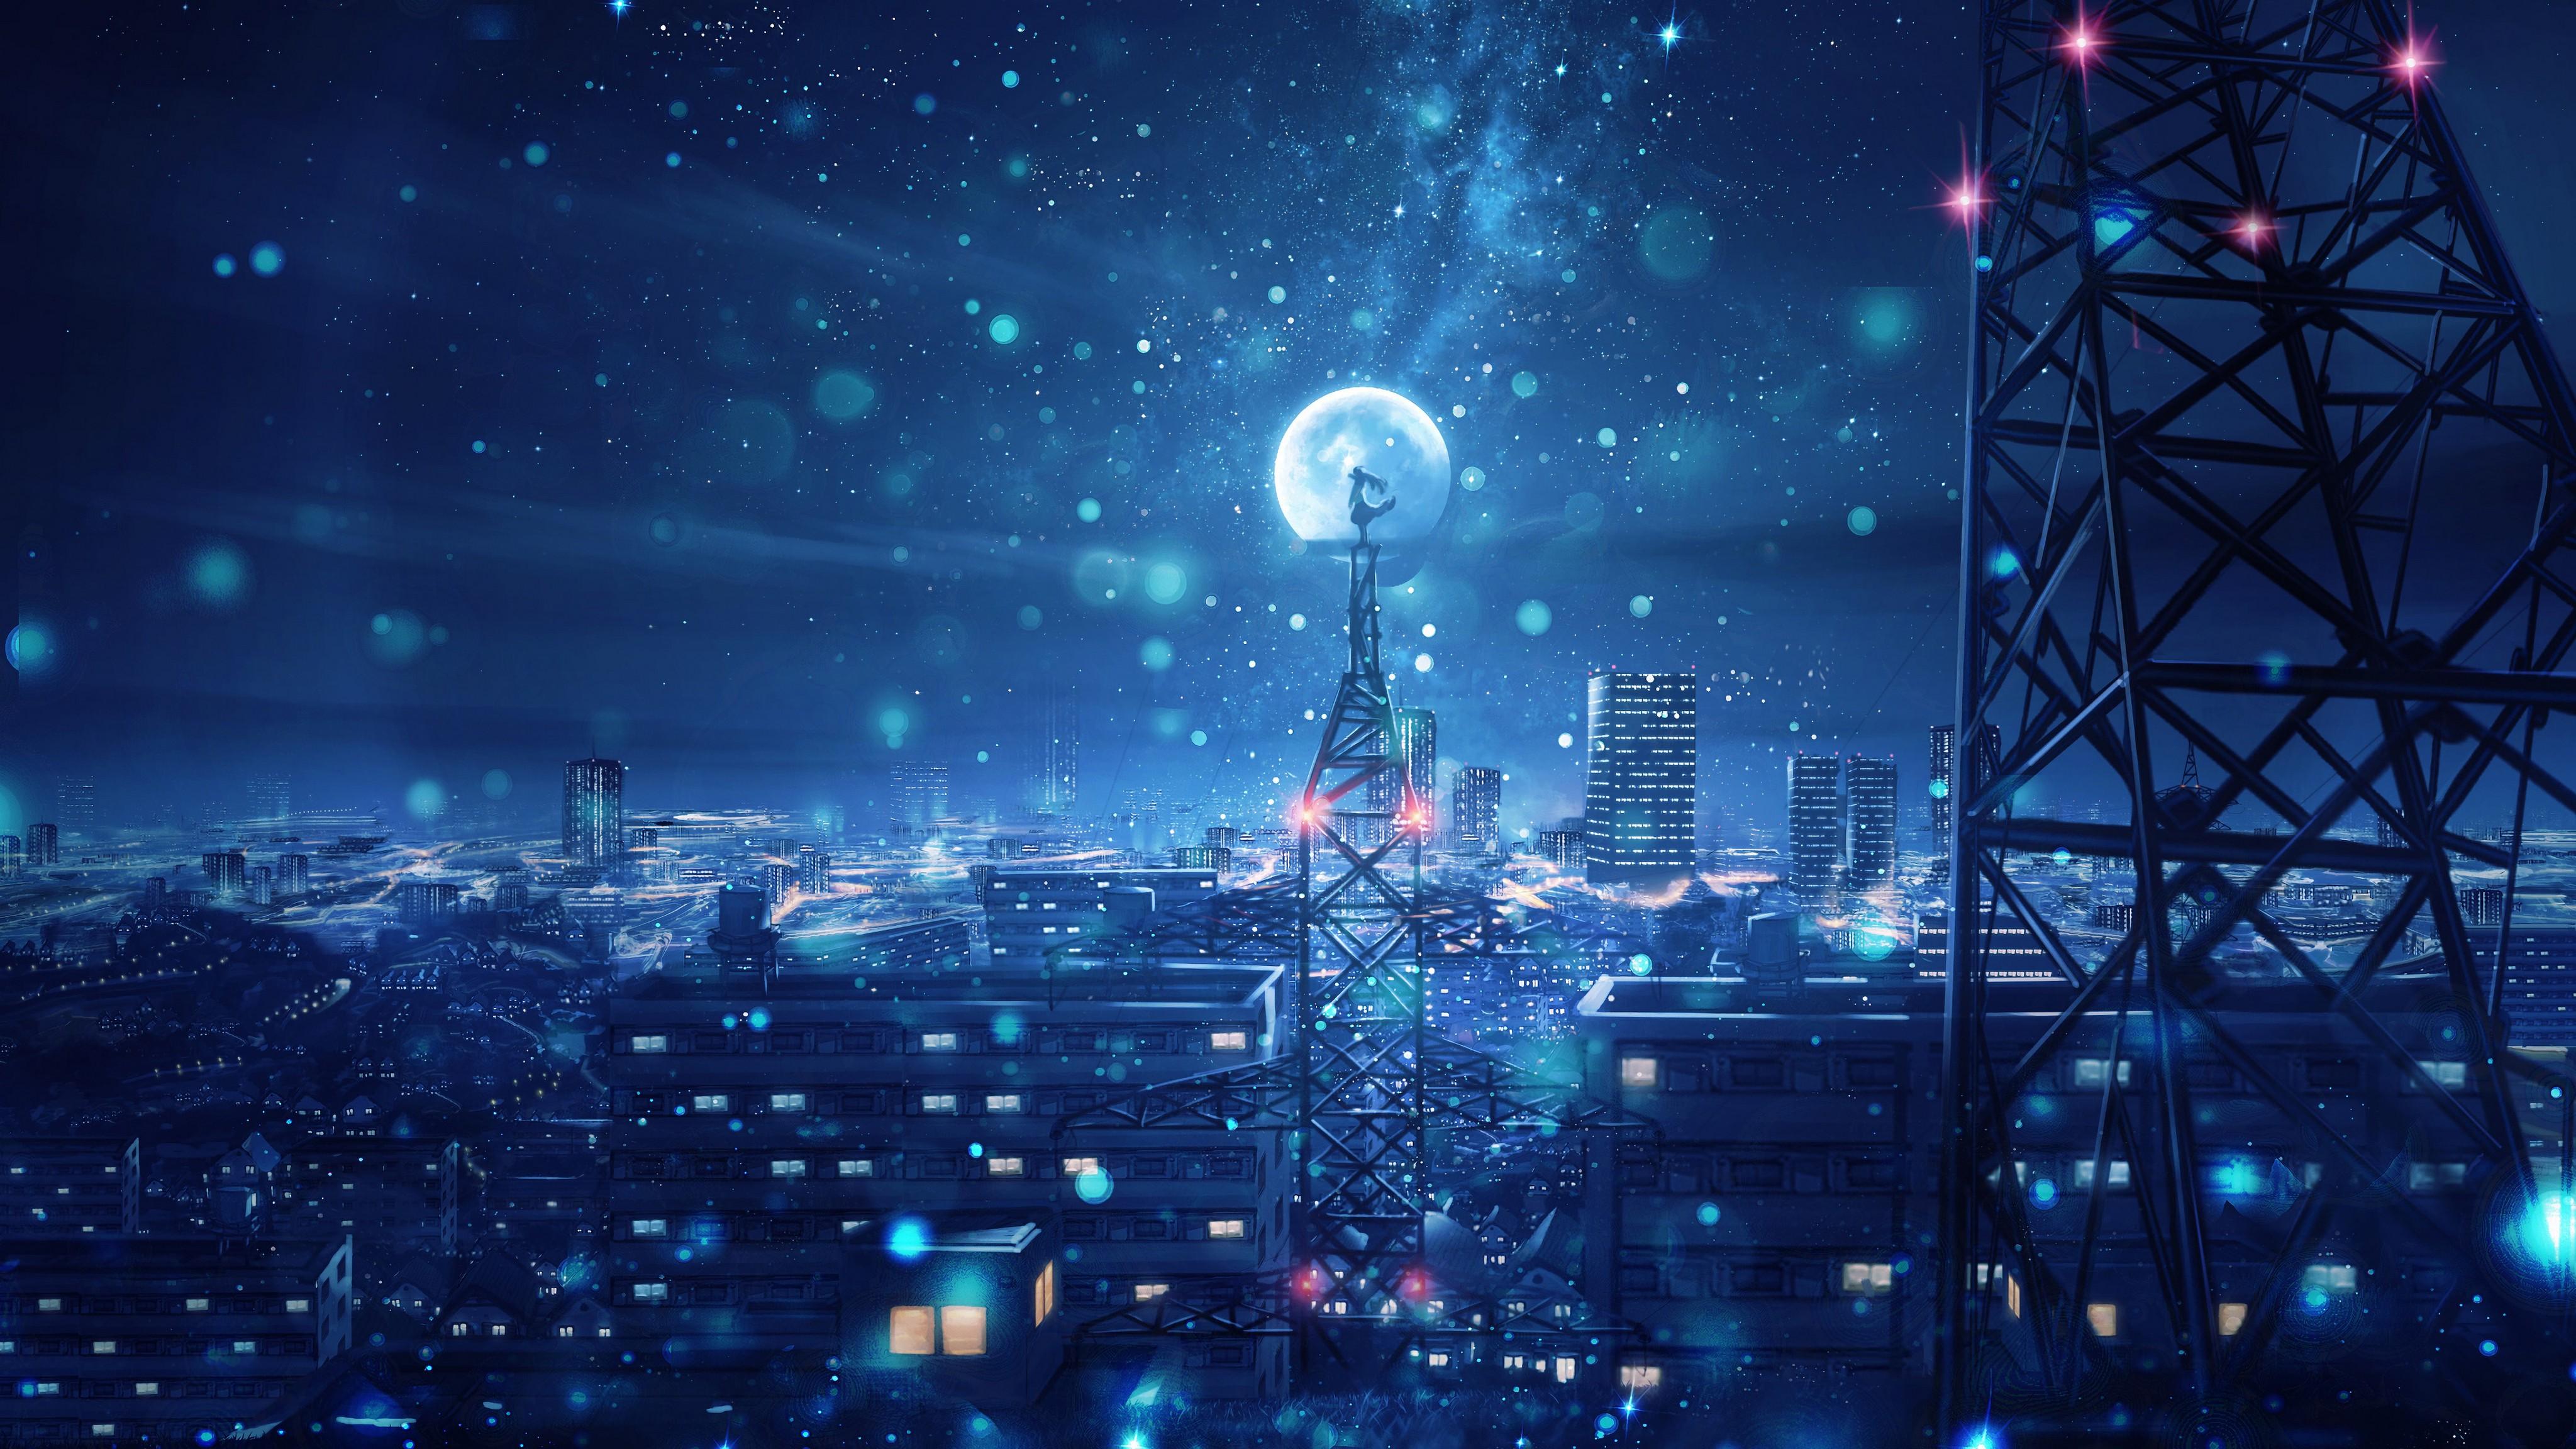 Blue Night Big Moon Anime Scenery 4k, HD Anime, 4k ...